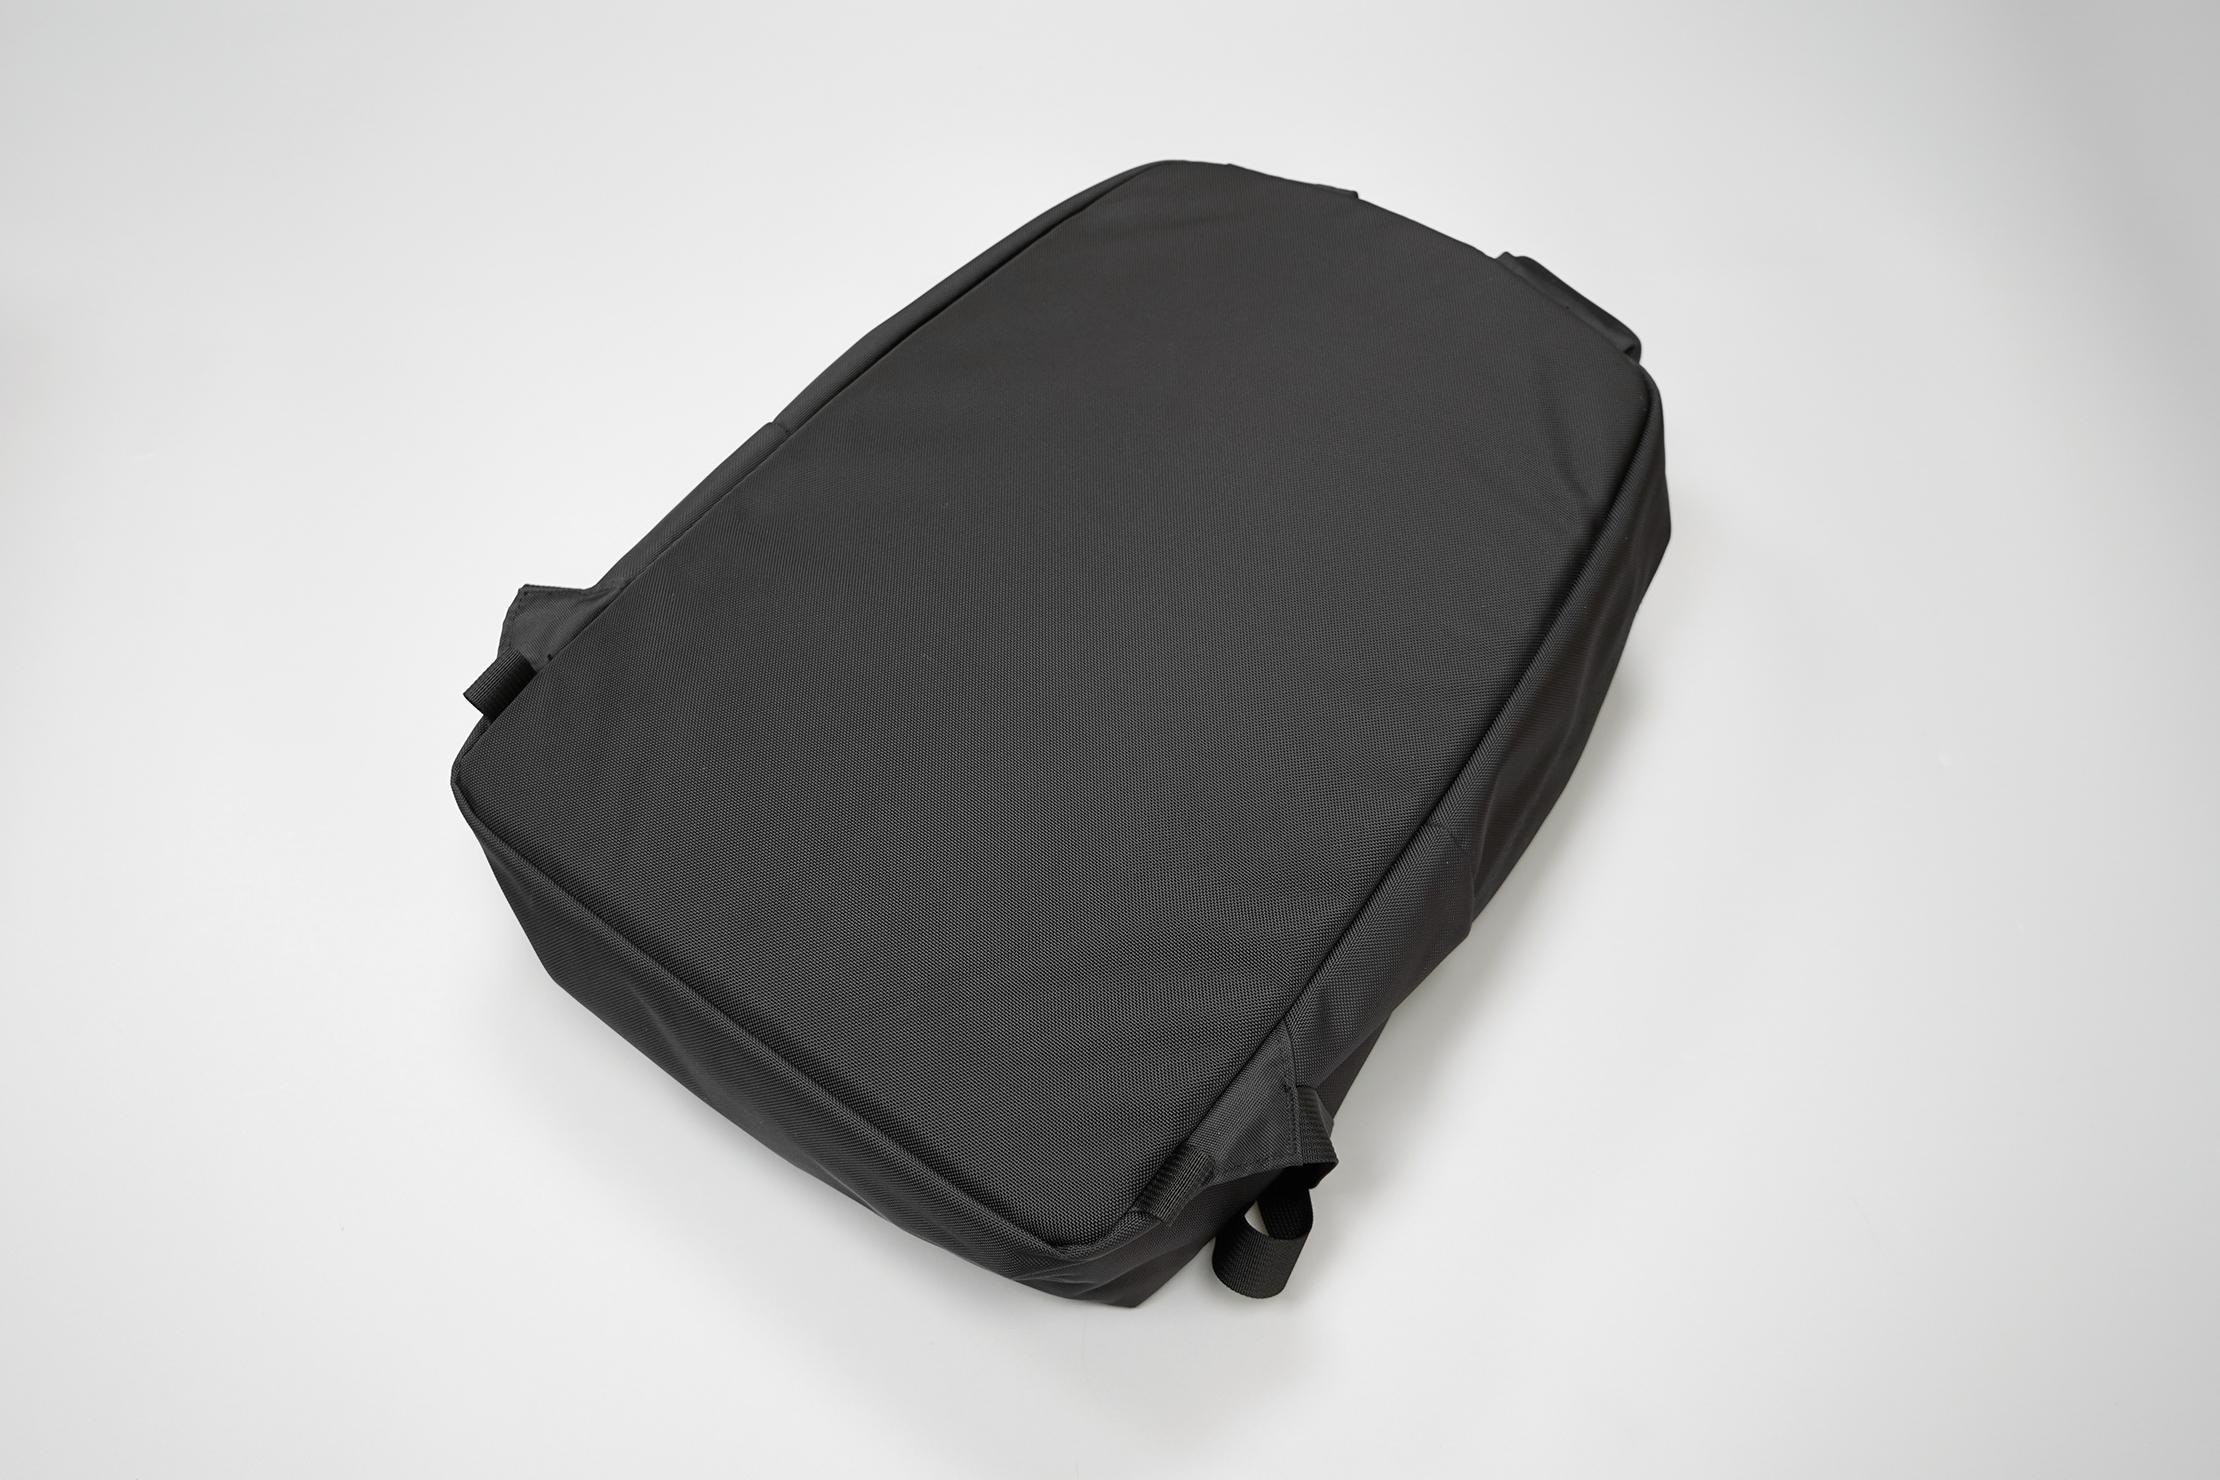 Tom Bihn Paragon Backpack | Padded back panel